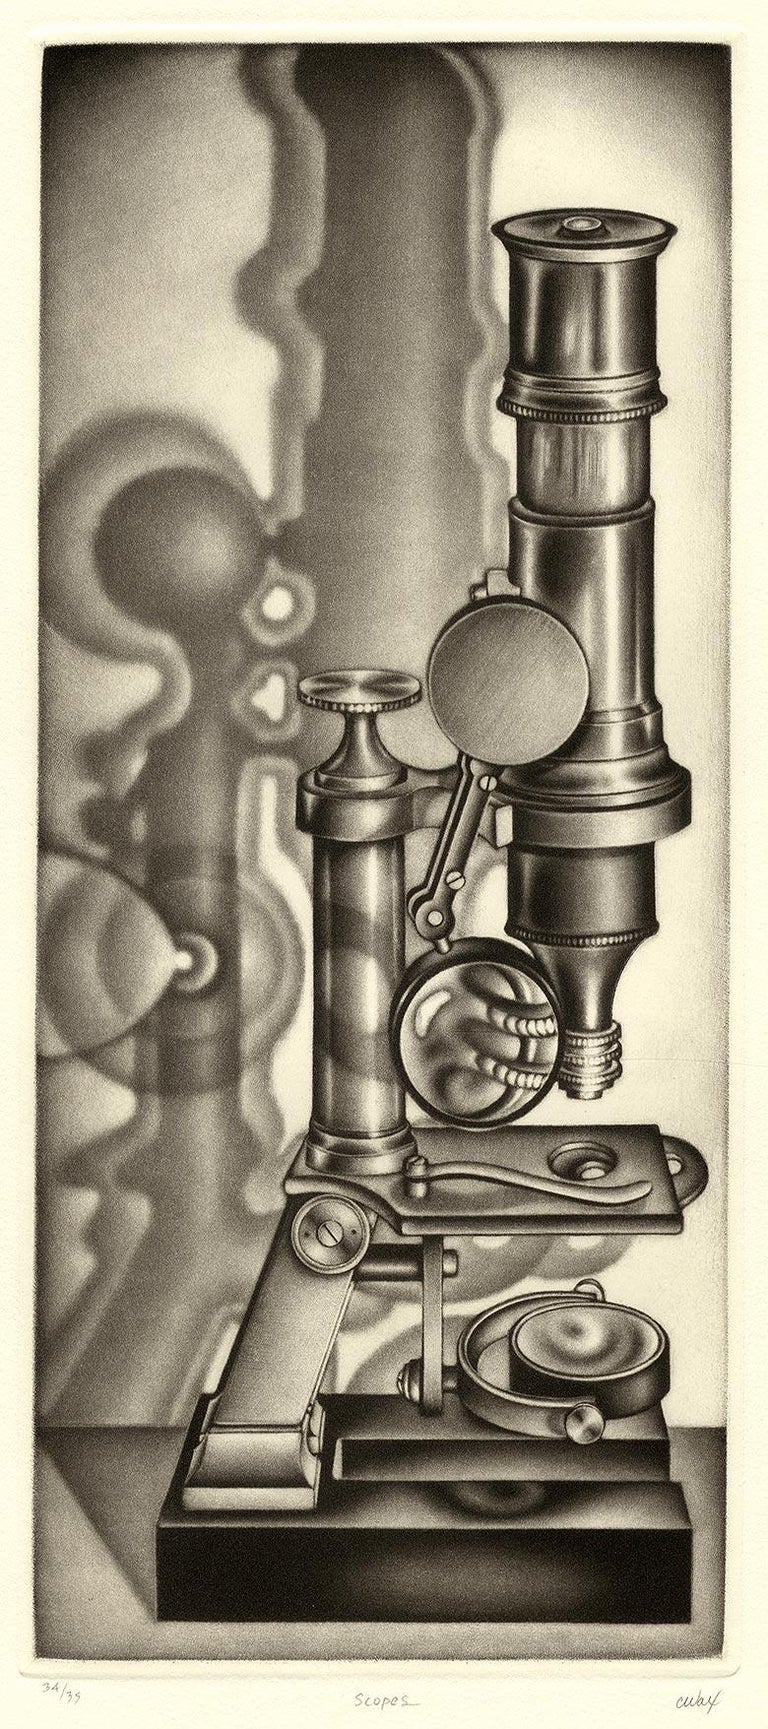 Scopes - Black Print by Carol Wax